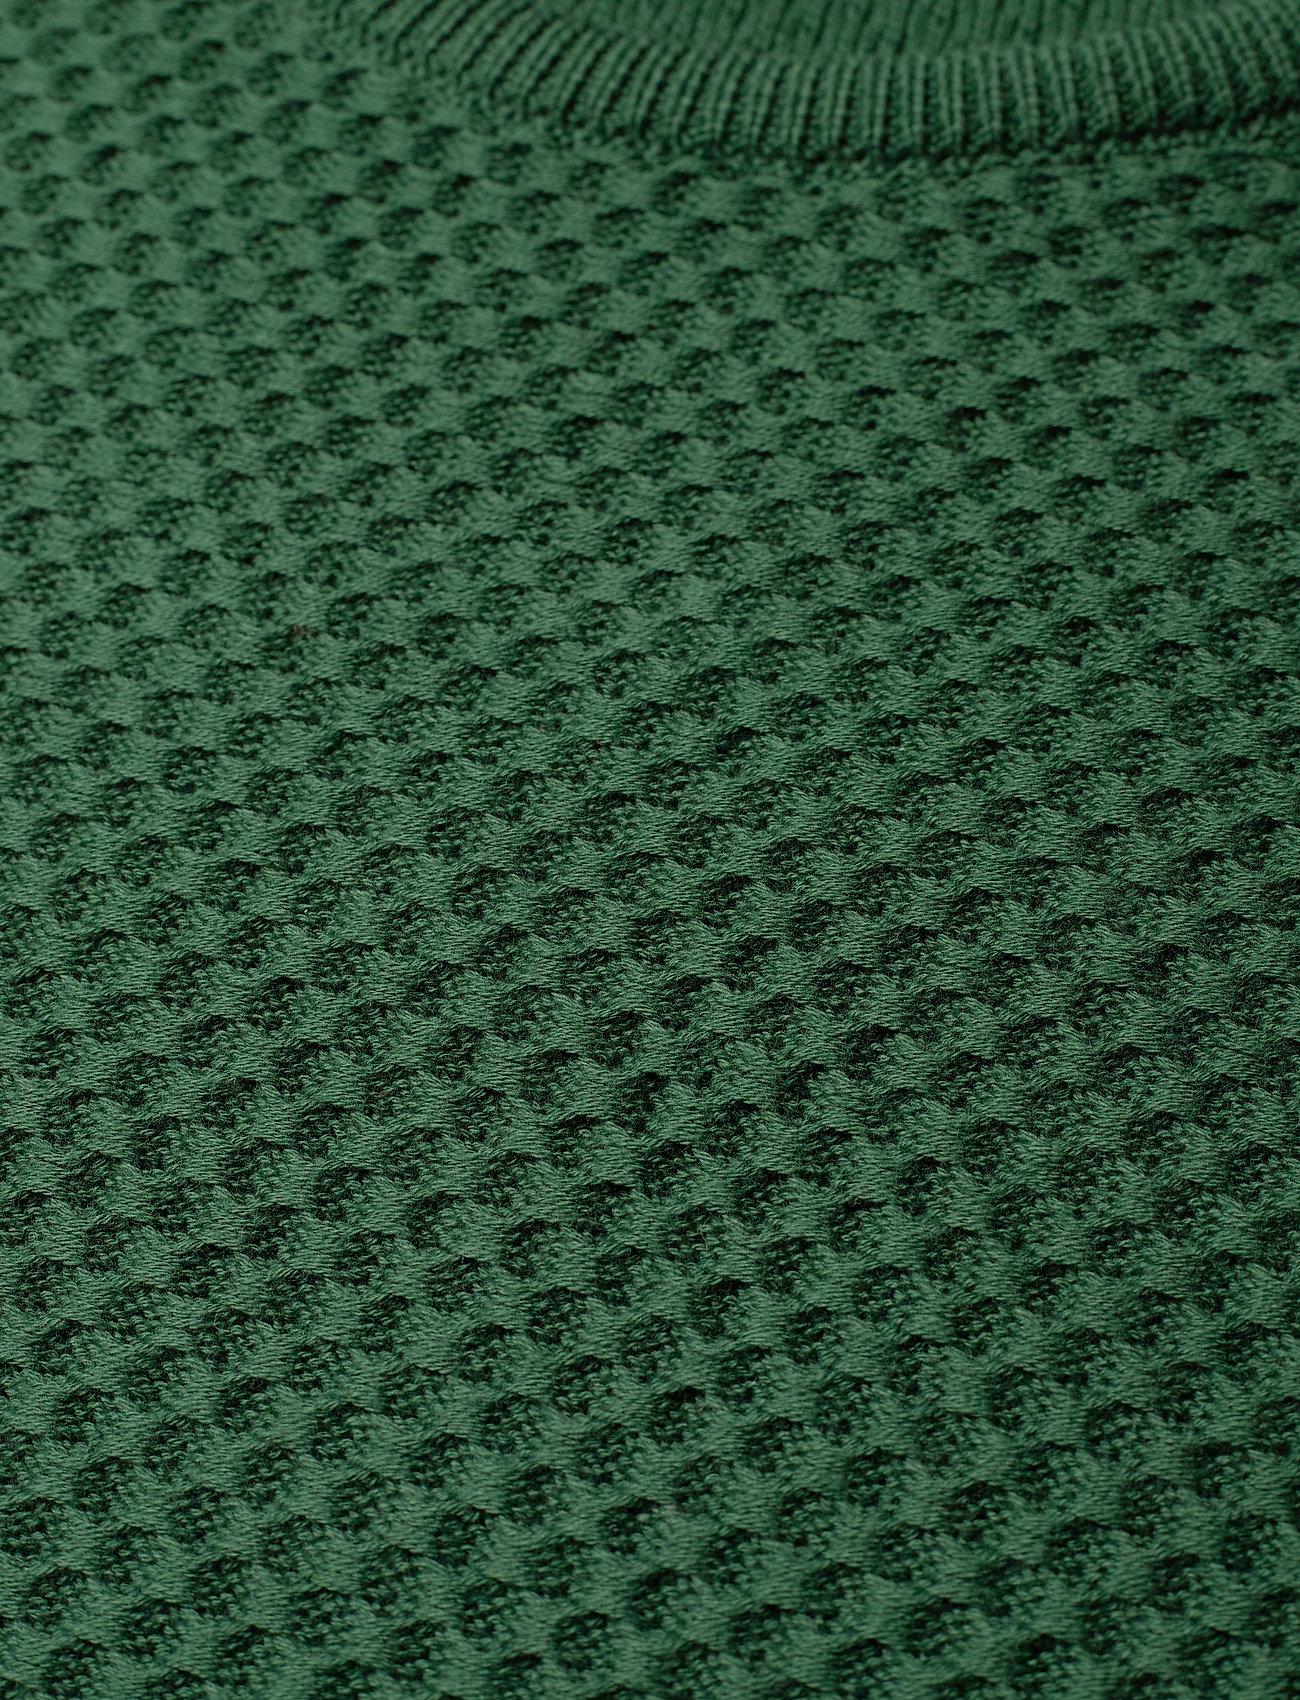 Knowledge Cotton Apparel FIELD crew neck knit - GOTS/Vegan - Strikkevarer PINENEEDLE - Menn Klær